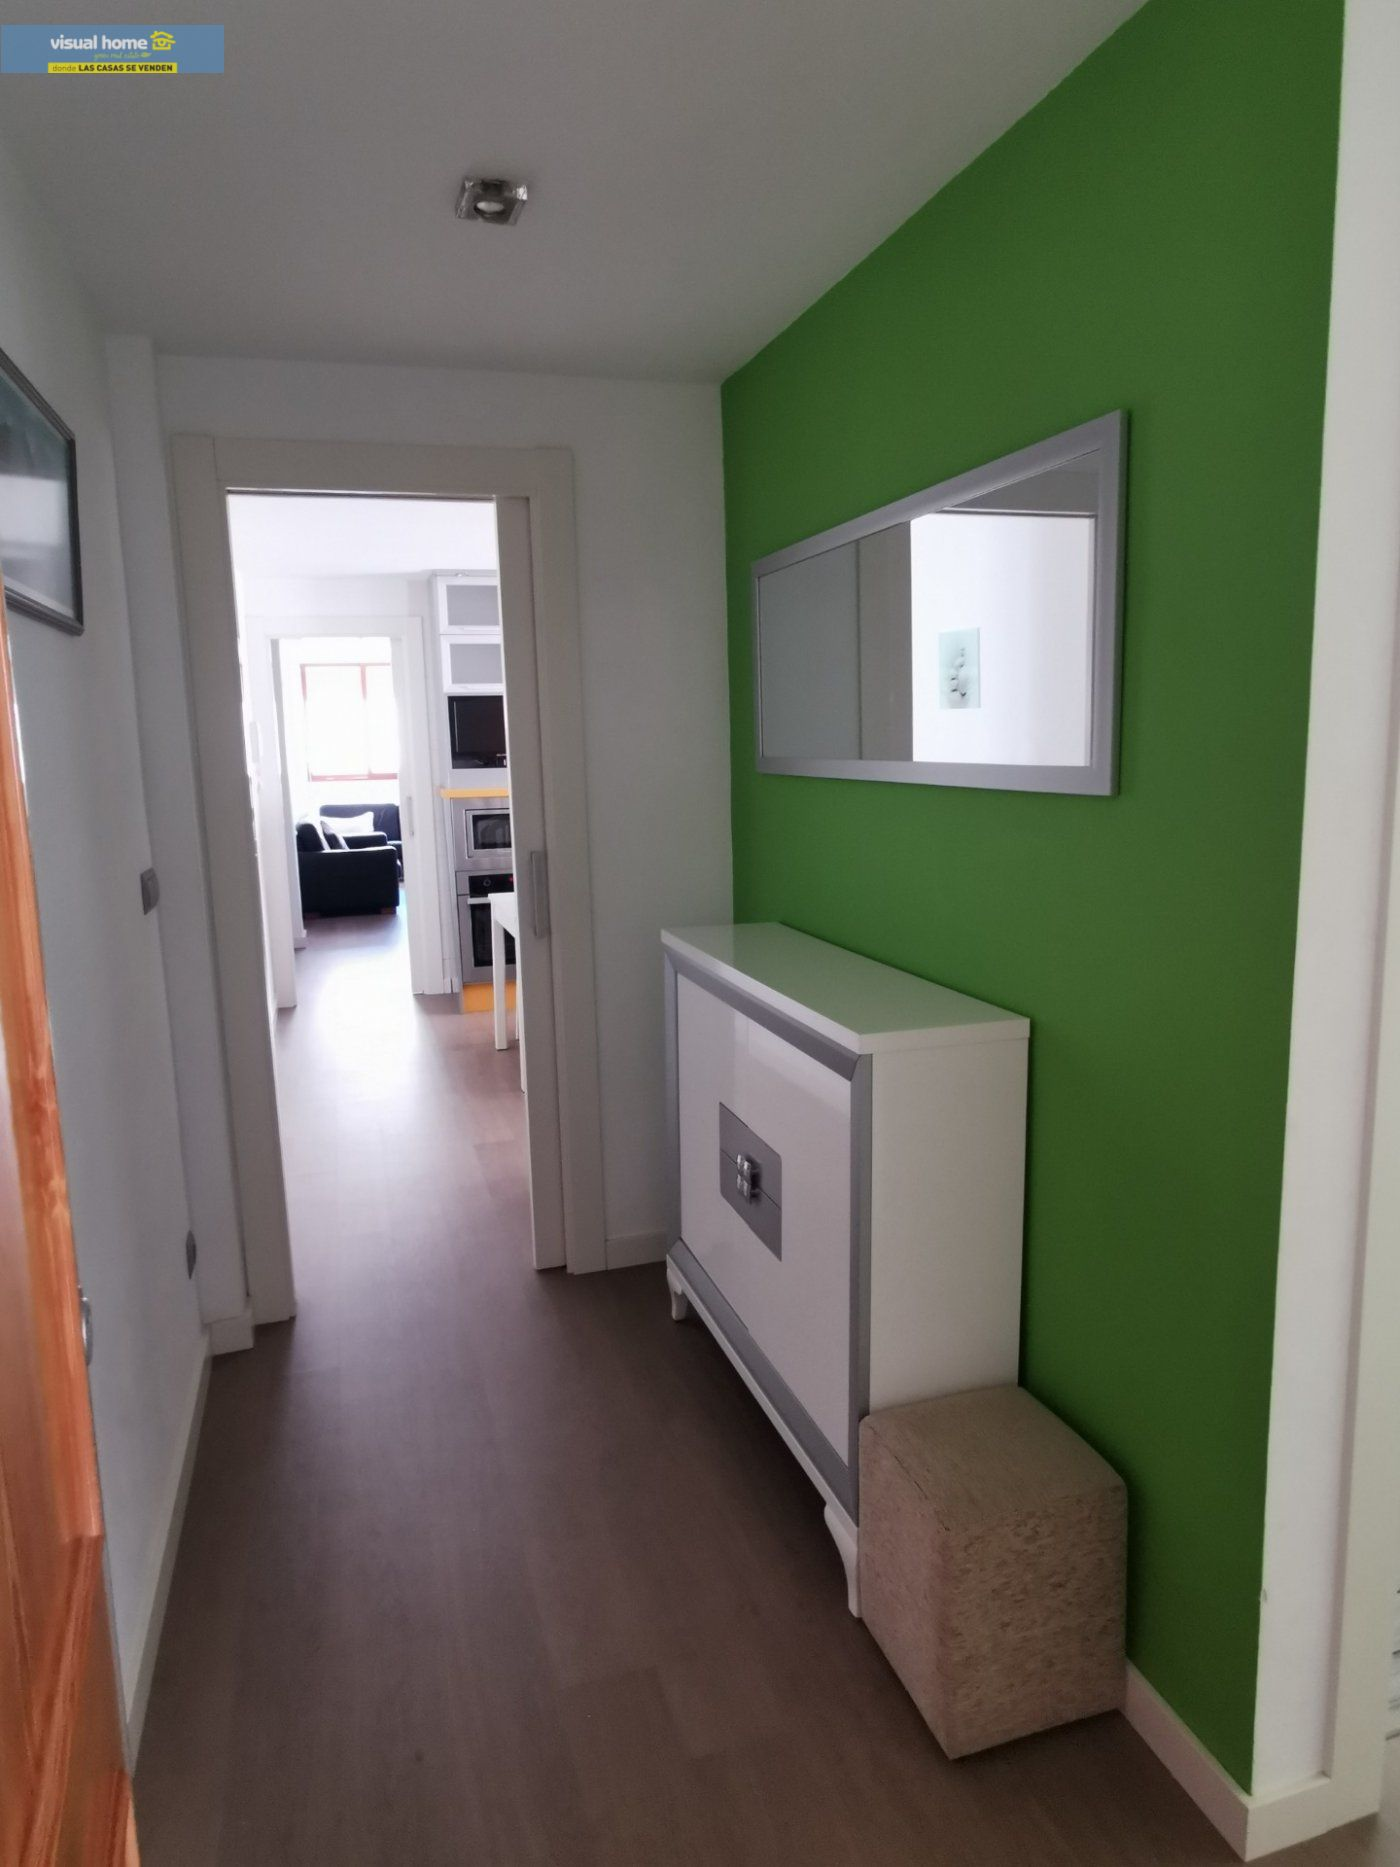 Apartamento en Benidorm zona Cala de Benidorm de 95 m²